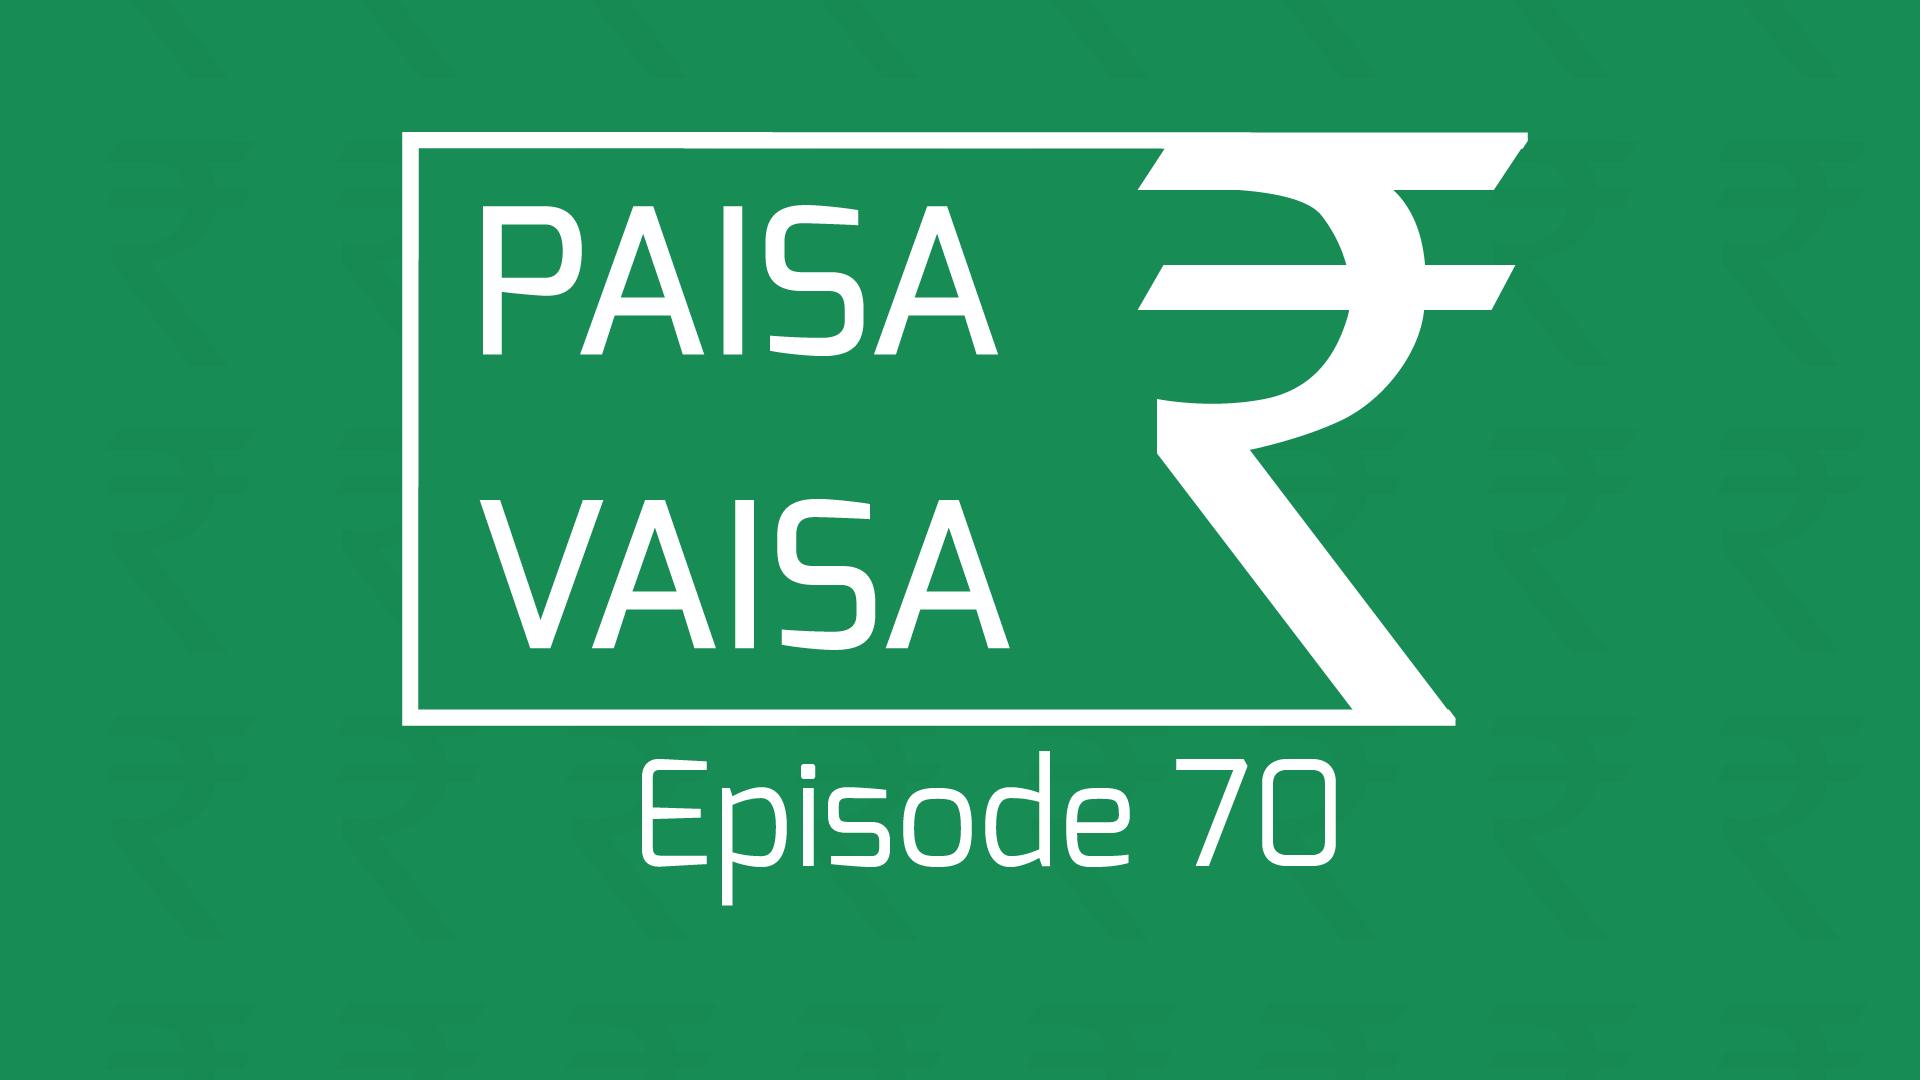 PaisaVaisaEpisode70.png